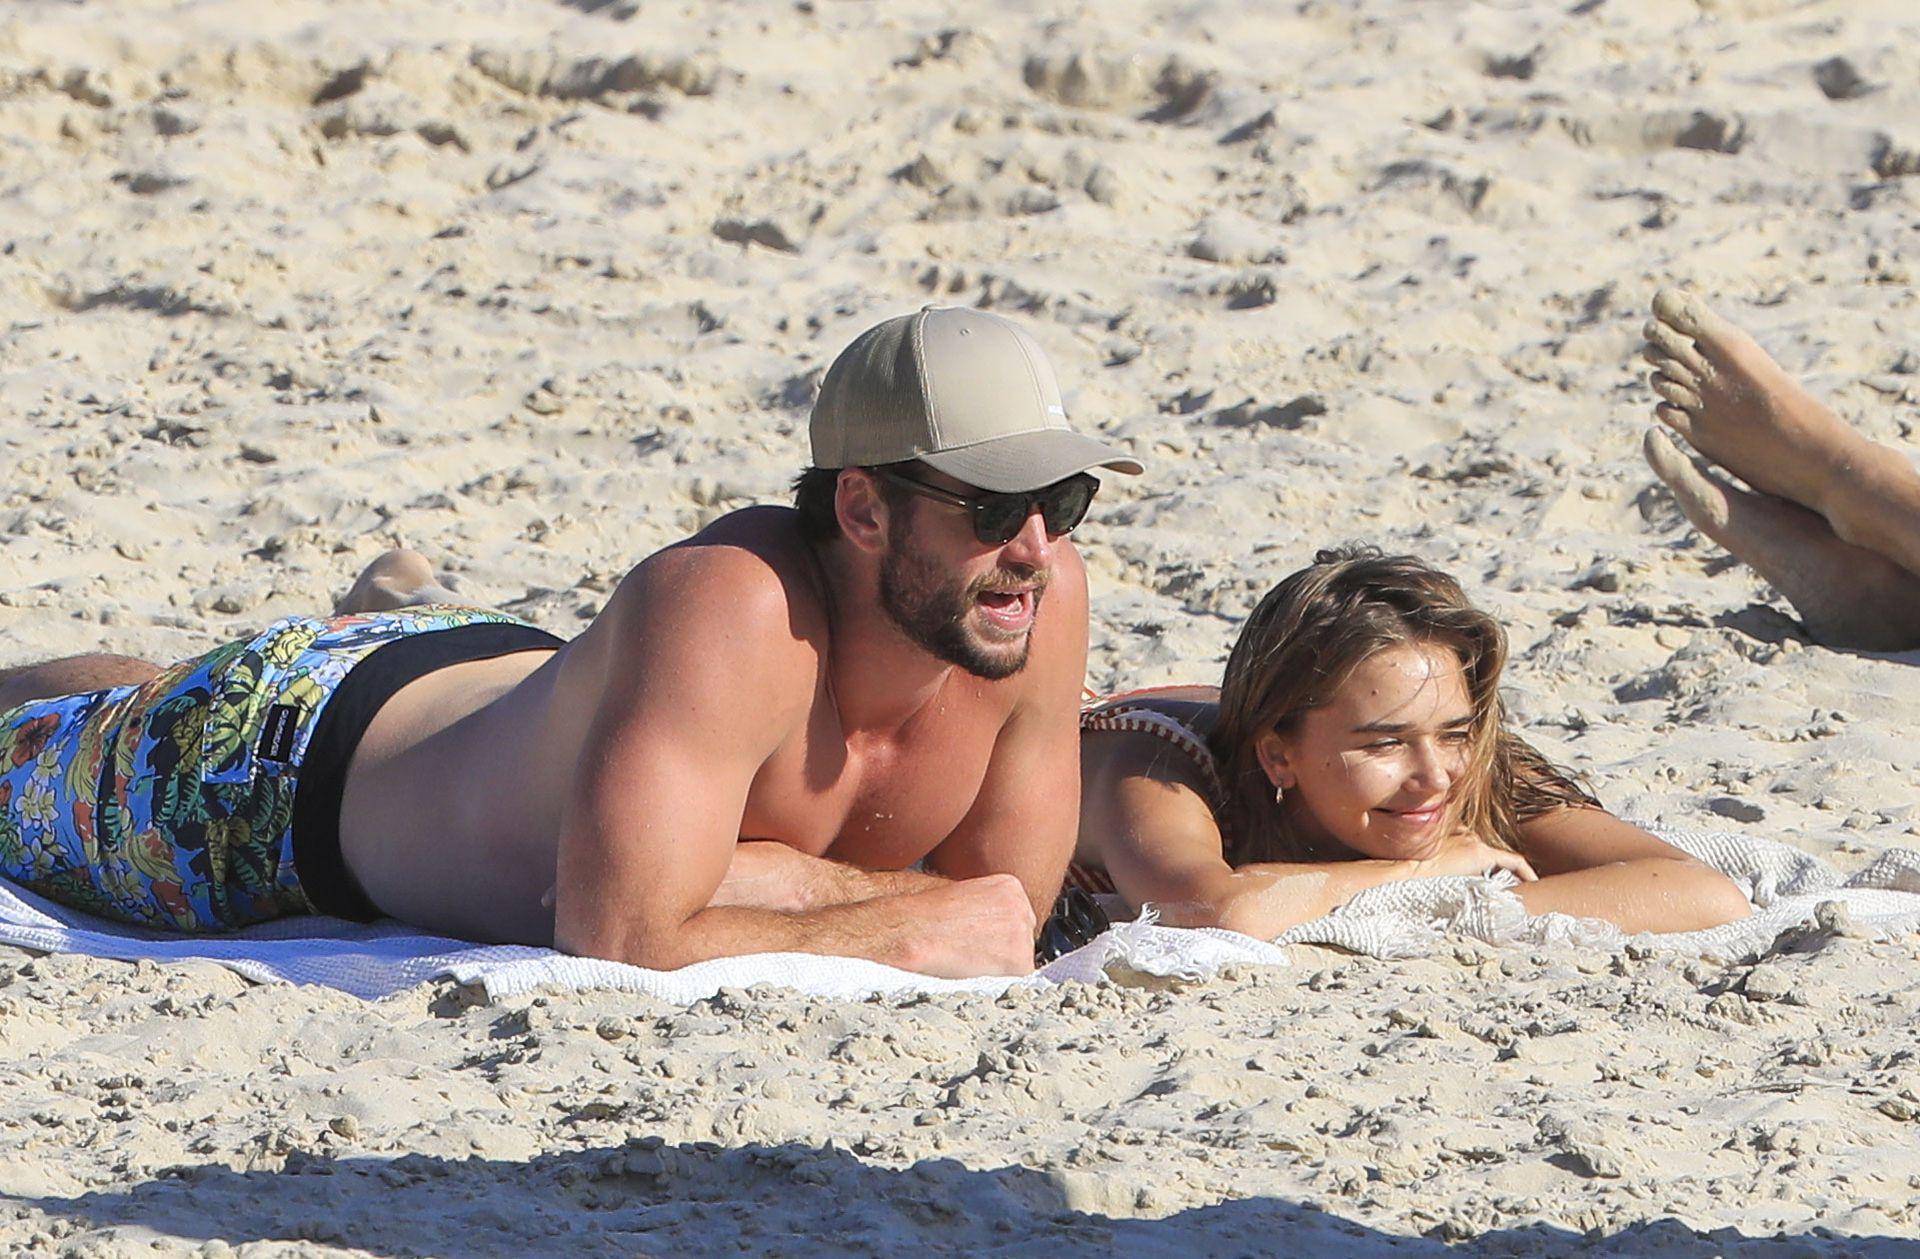 Gabriella Brooks Hot – Liam Hemsworth's New Girlfriend 0018